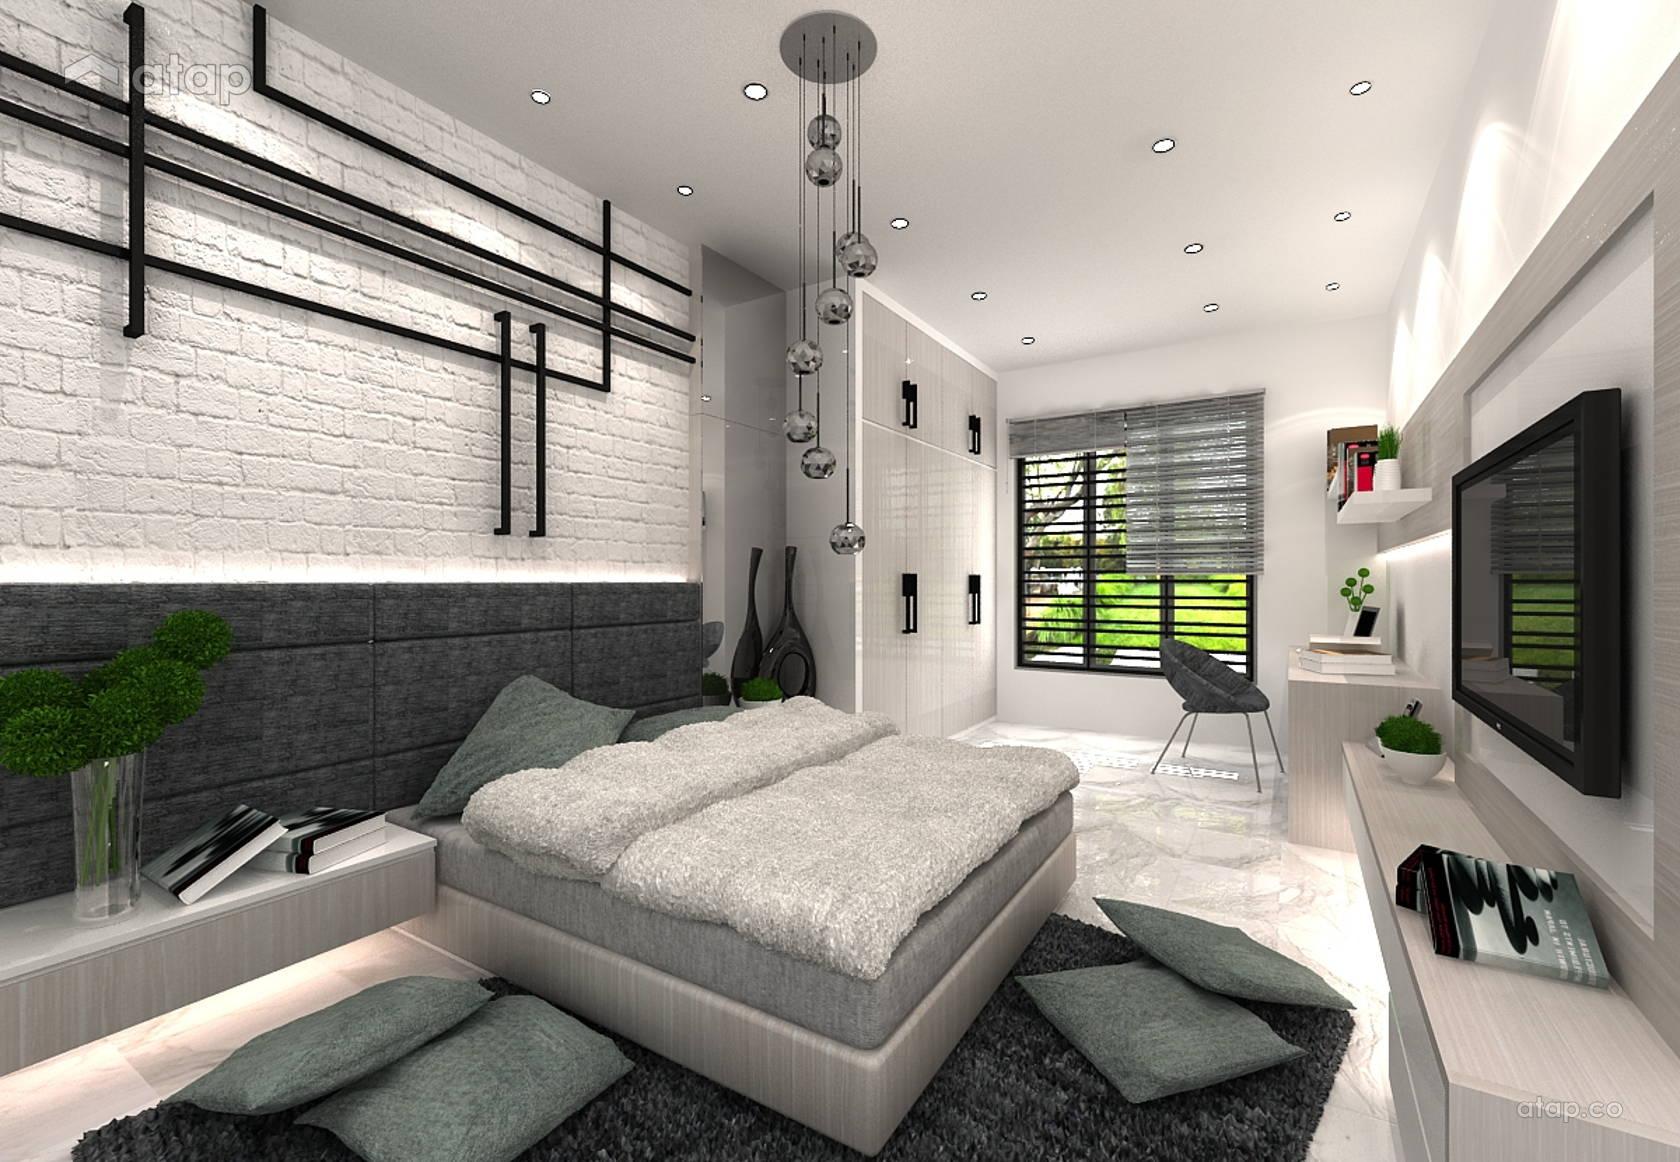 Modern Loft Style interior design renovation ideas, photos and